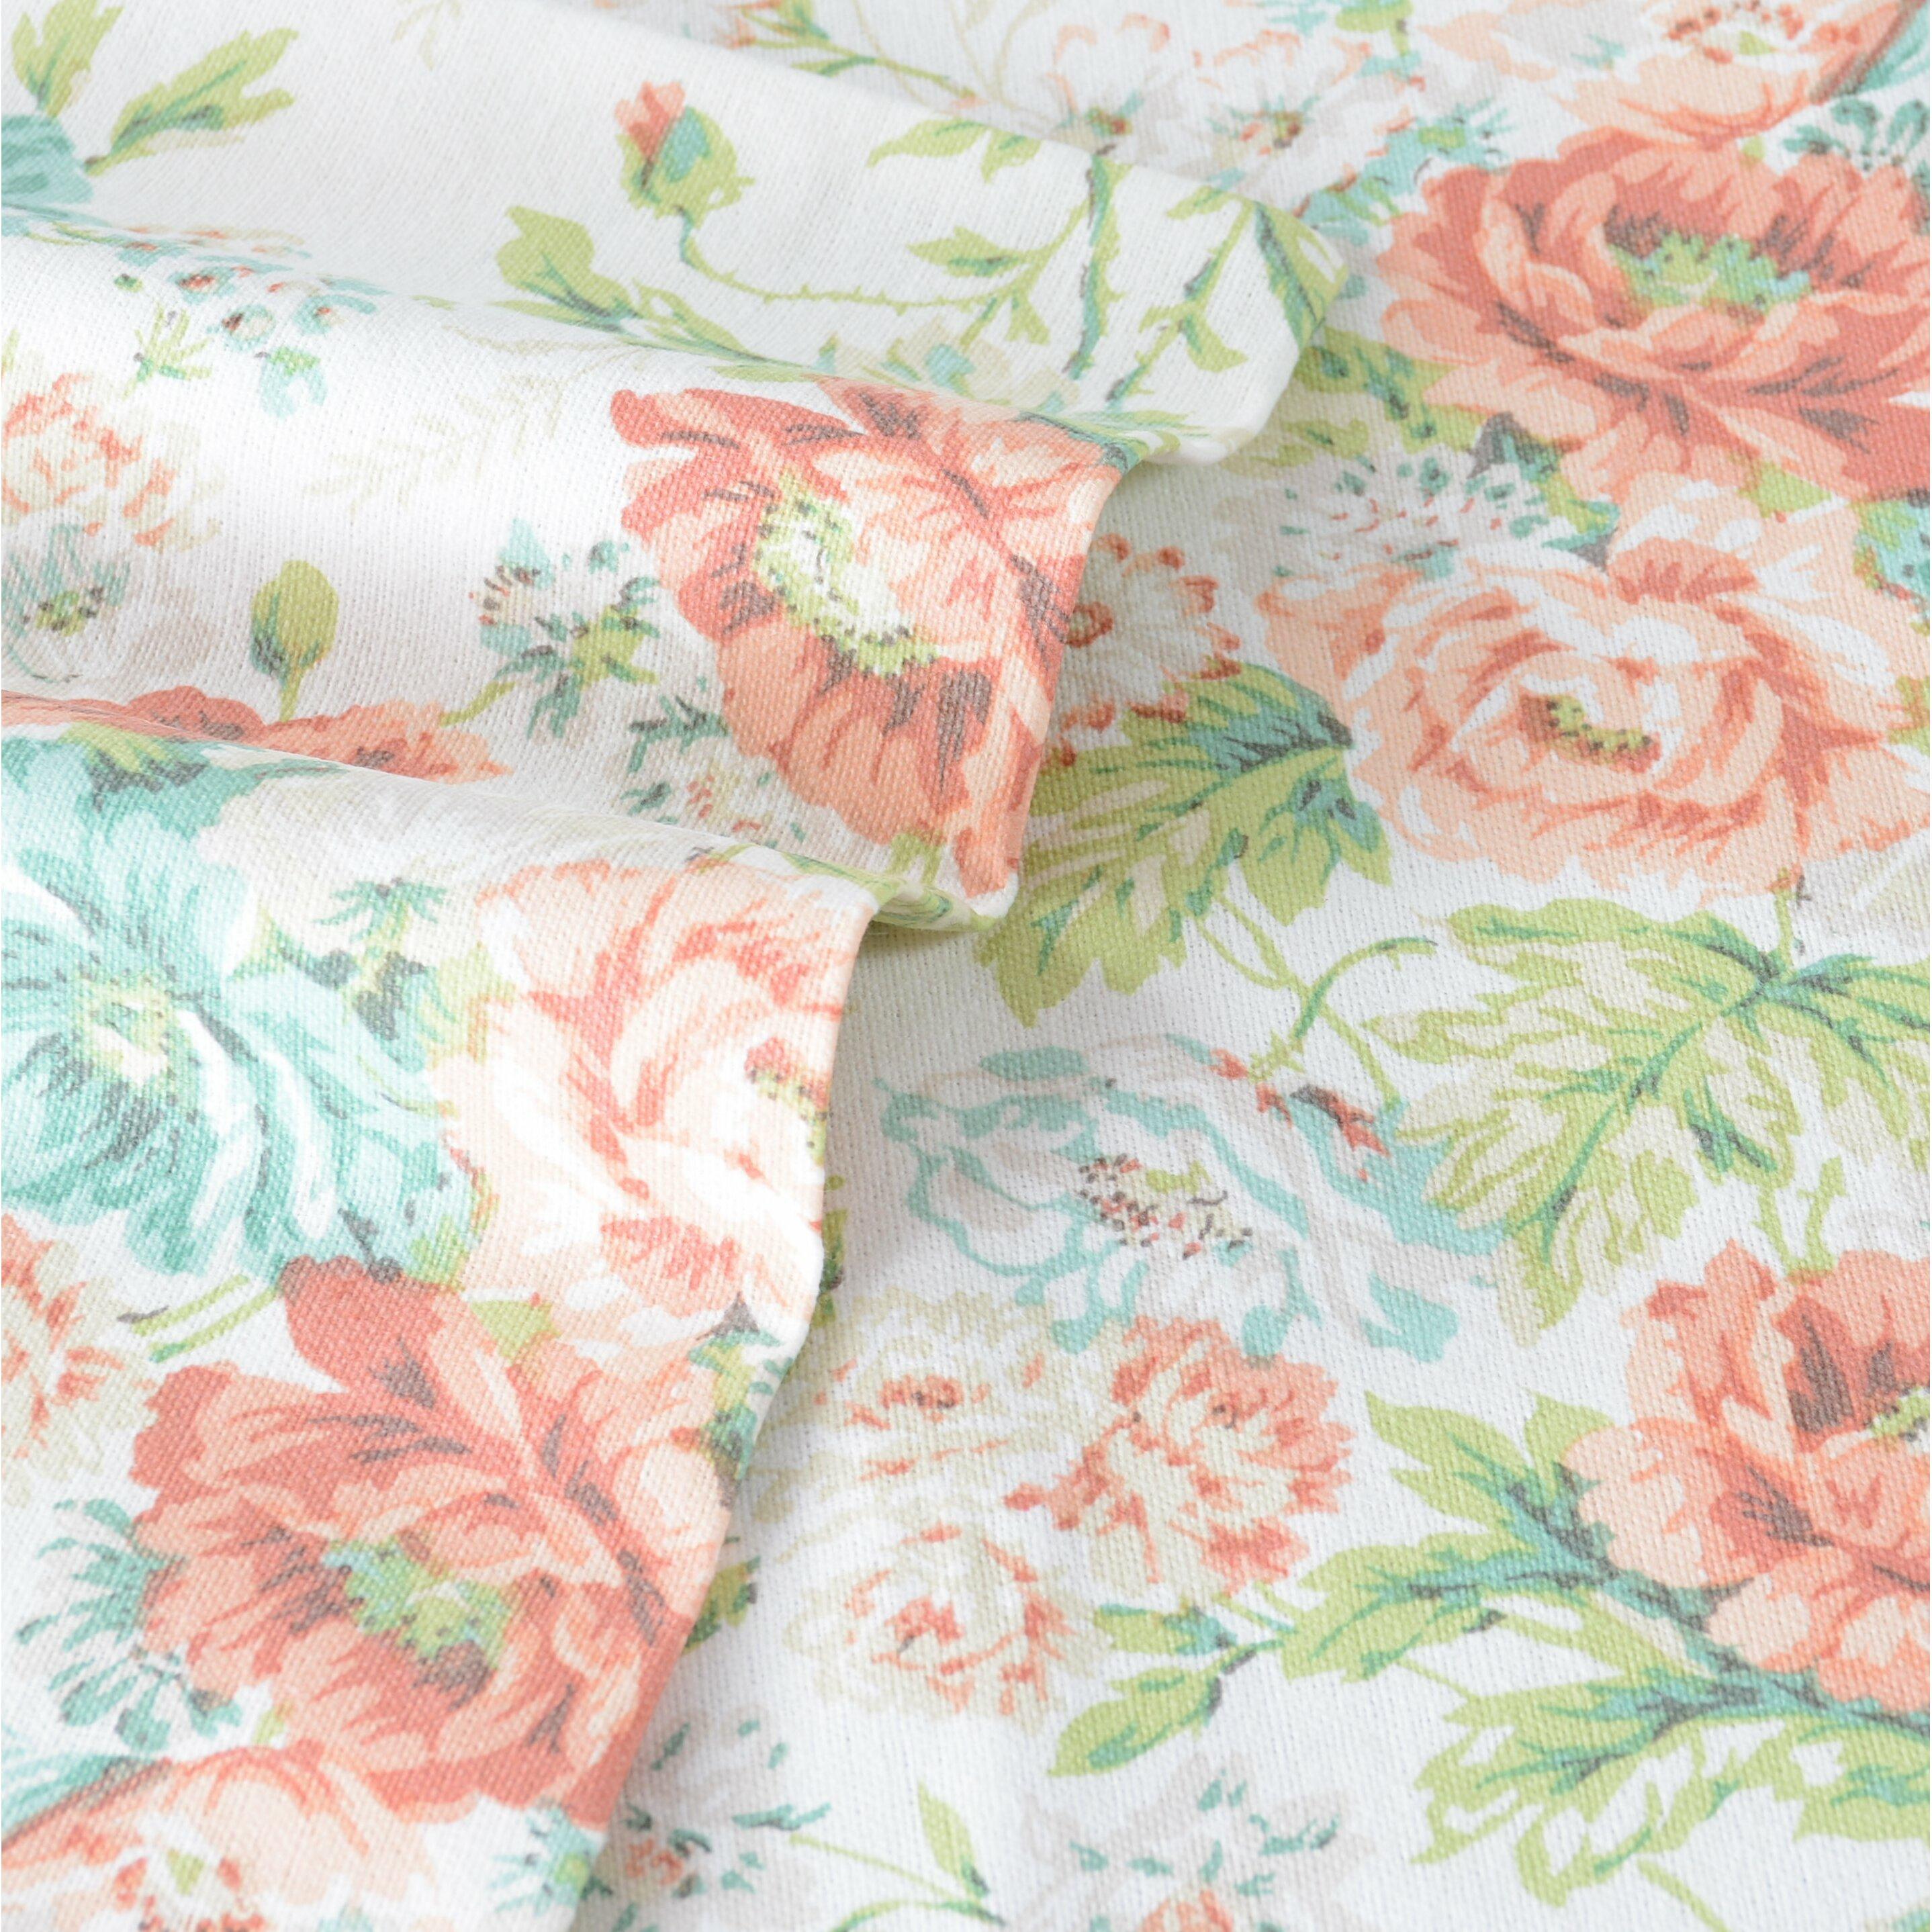 Laura Ashley Flannel Queen Sheet Set: Laura Ashley Home Arundel Apricot Flannel Sheet Set